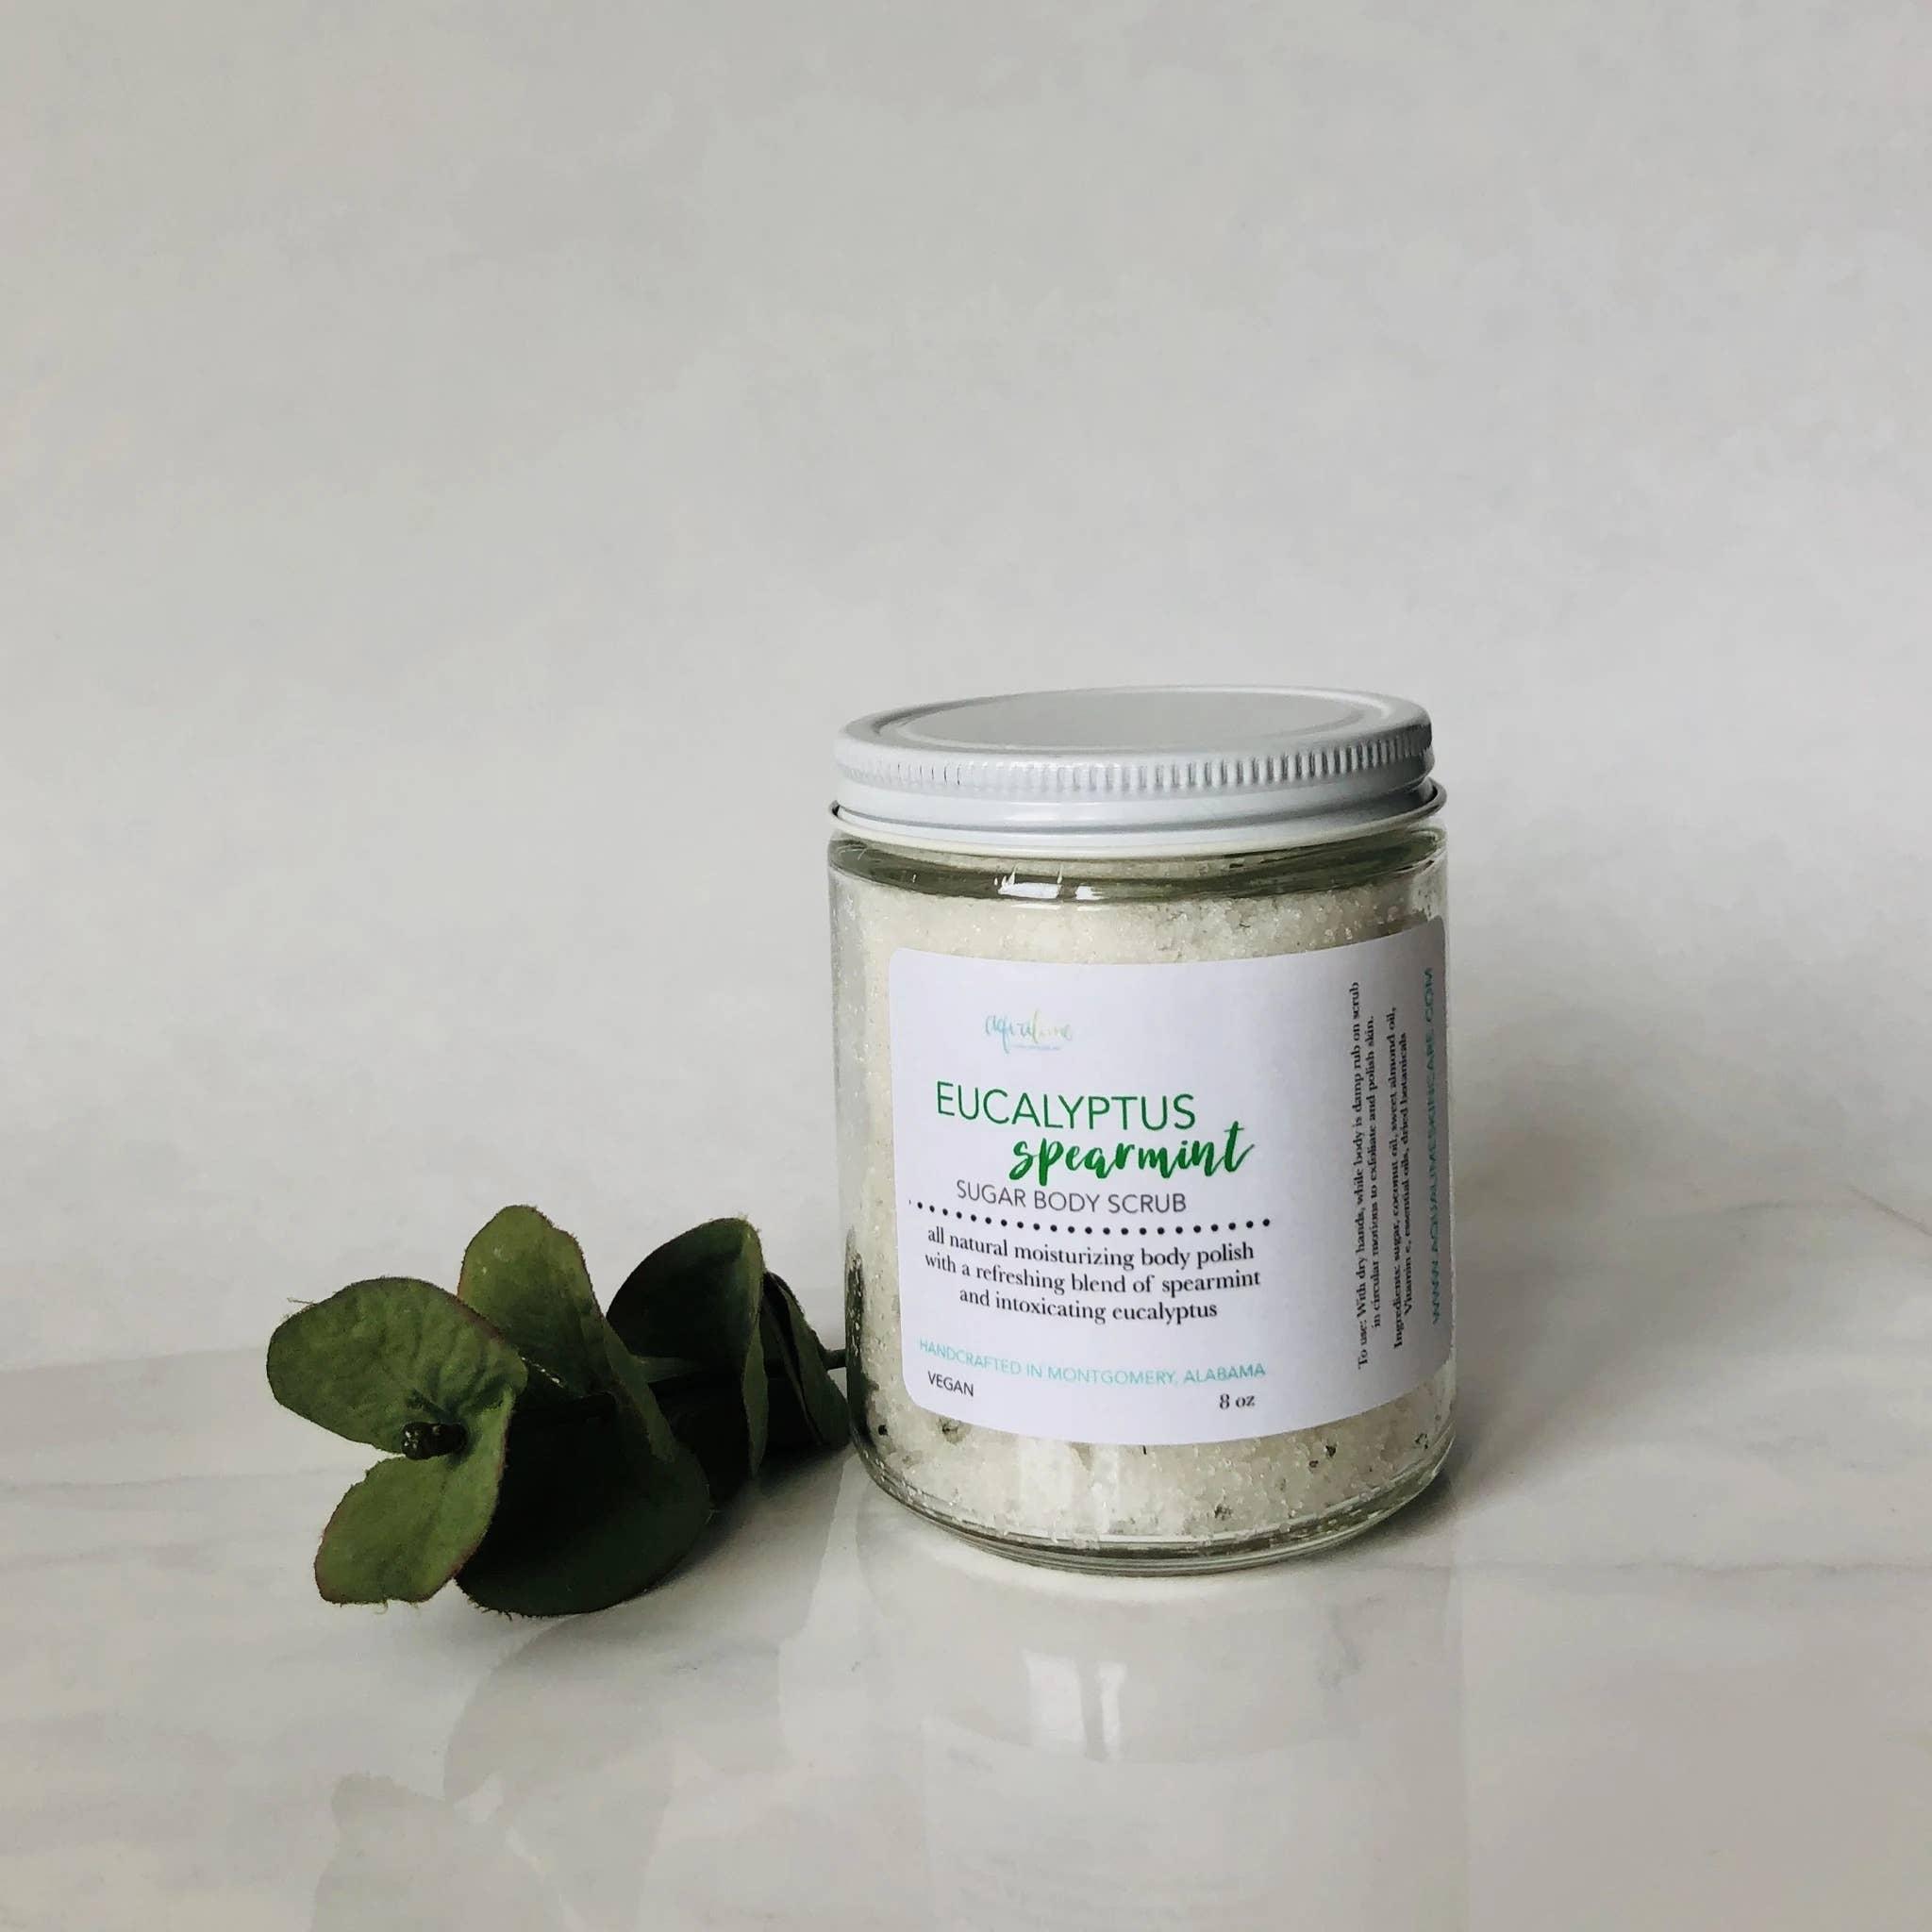 Eucalyptus Spearmint Sugar Body Scrub   Trada Marketplace